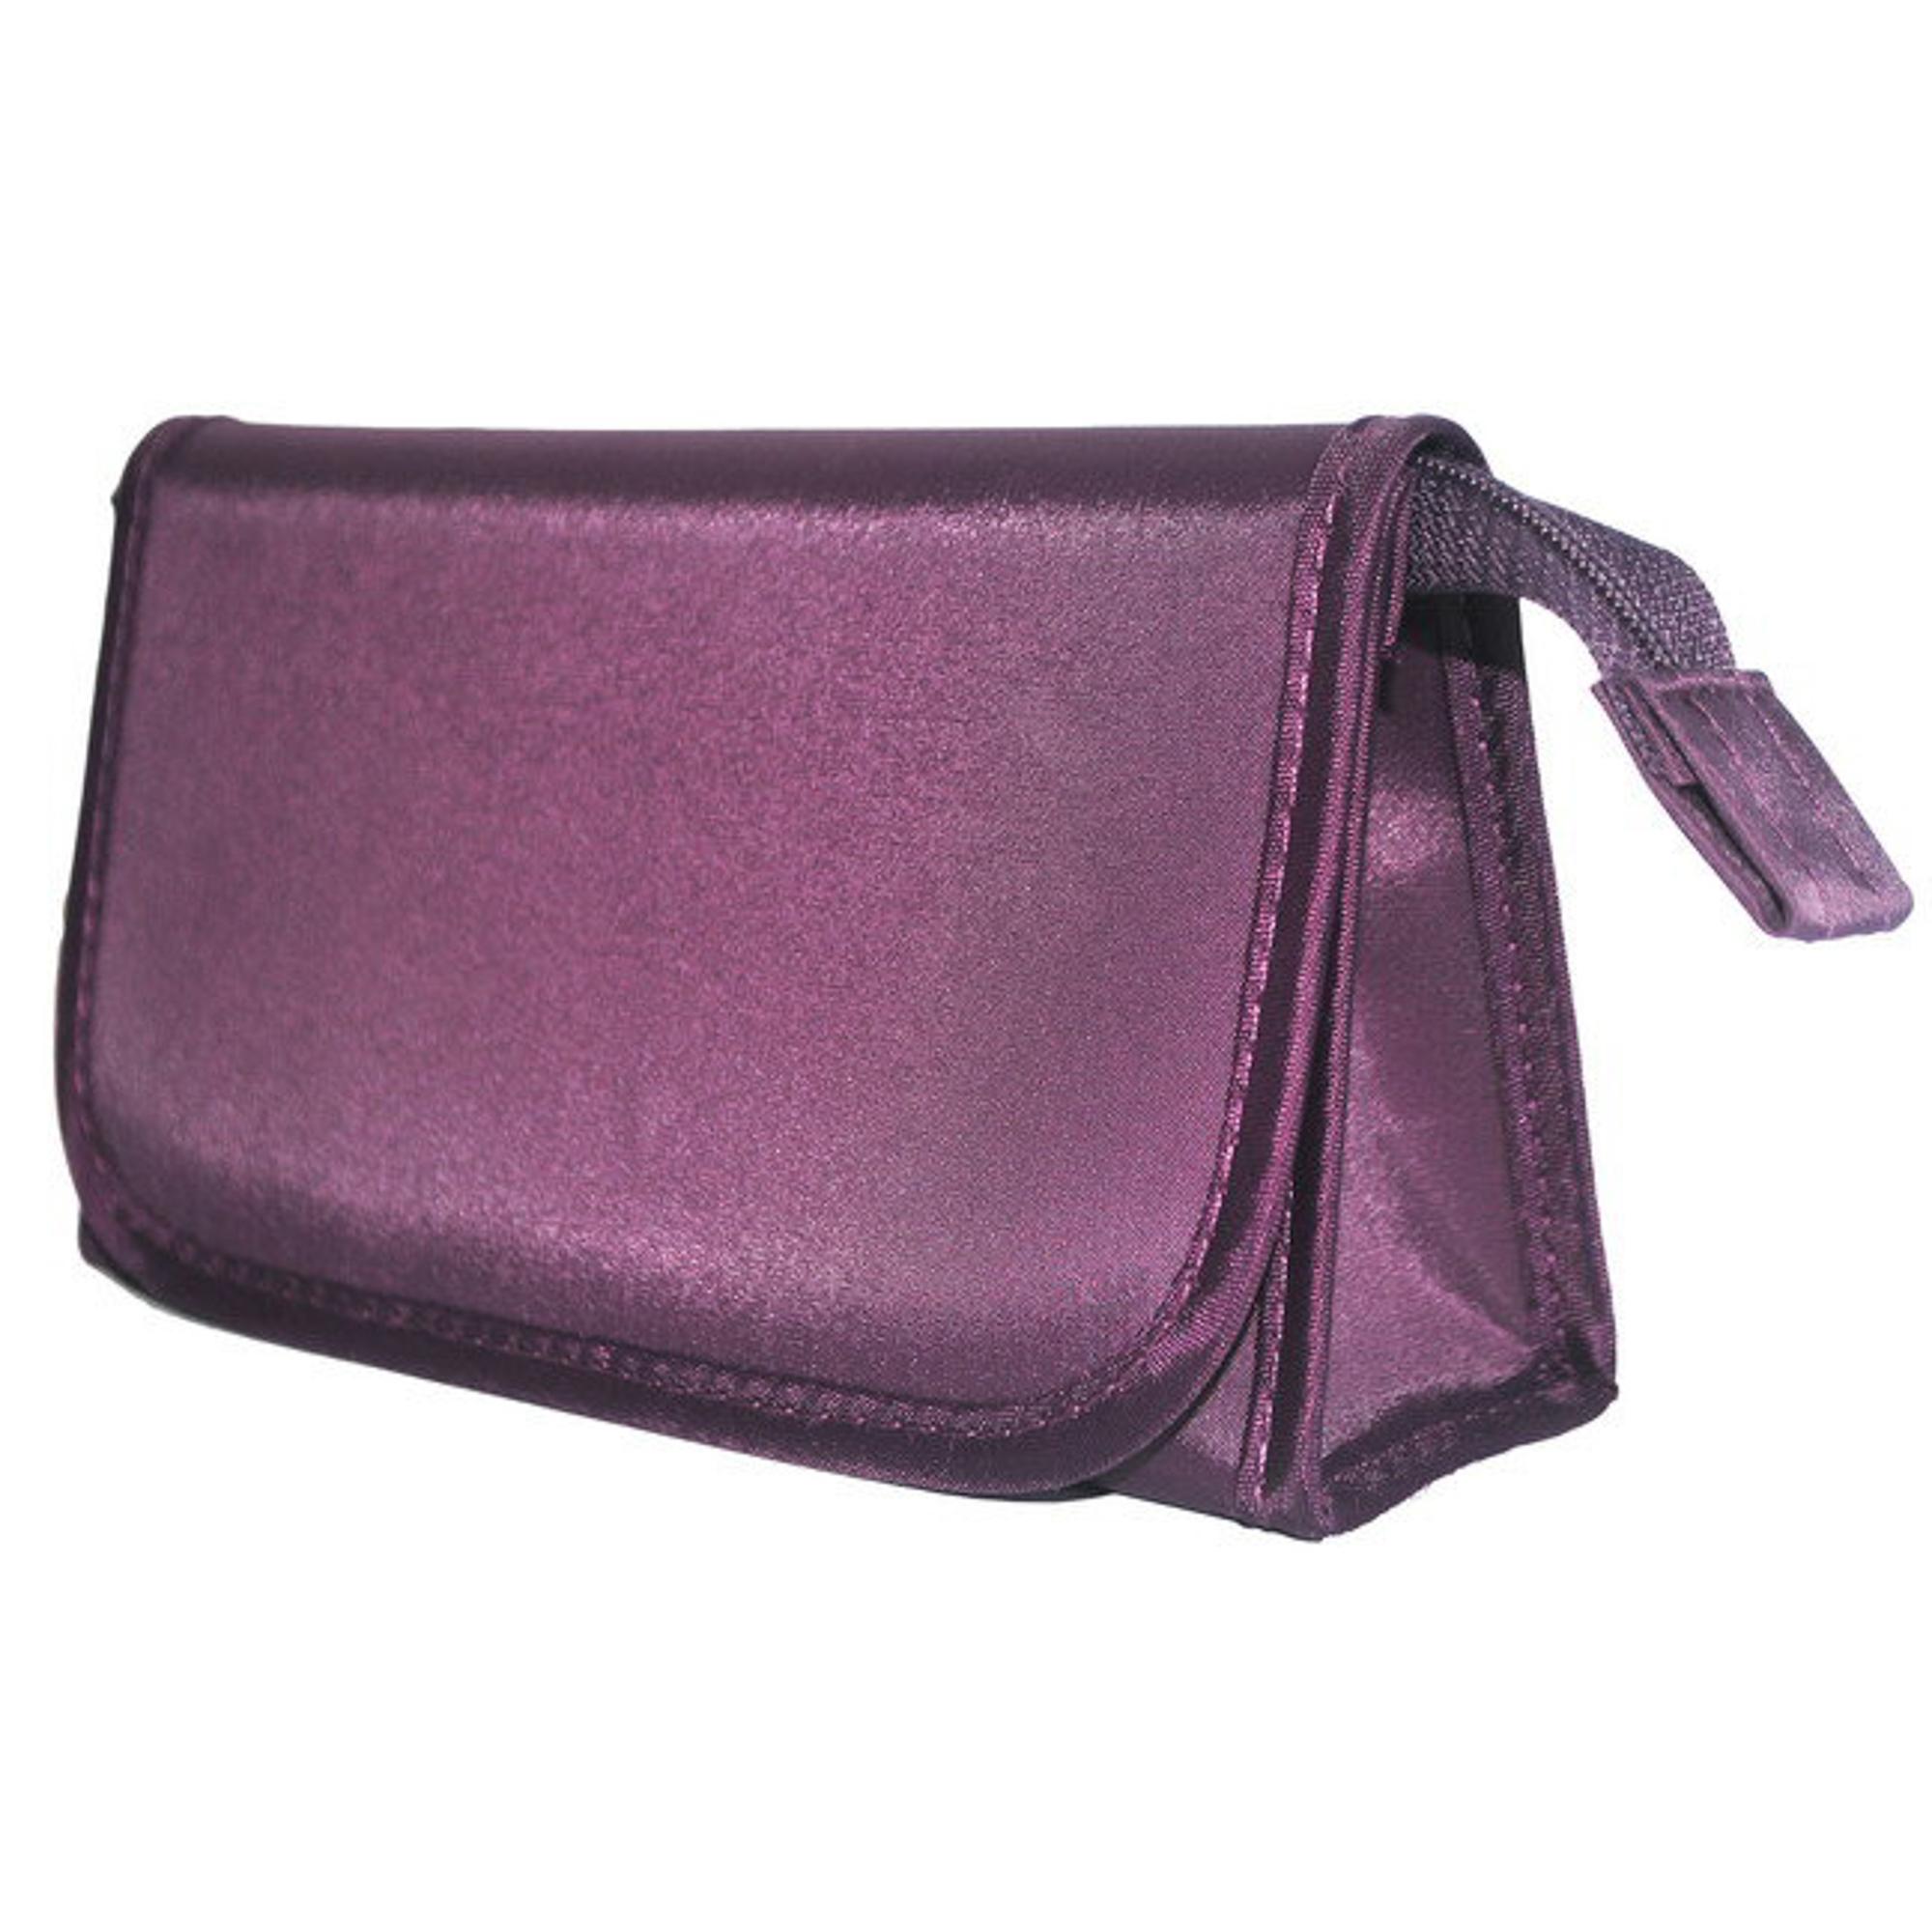 Косметичка Beauty Фиолетовая клапан с зеркалом